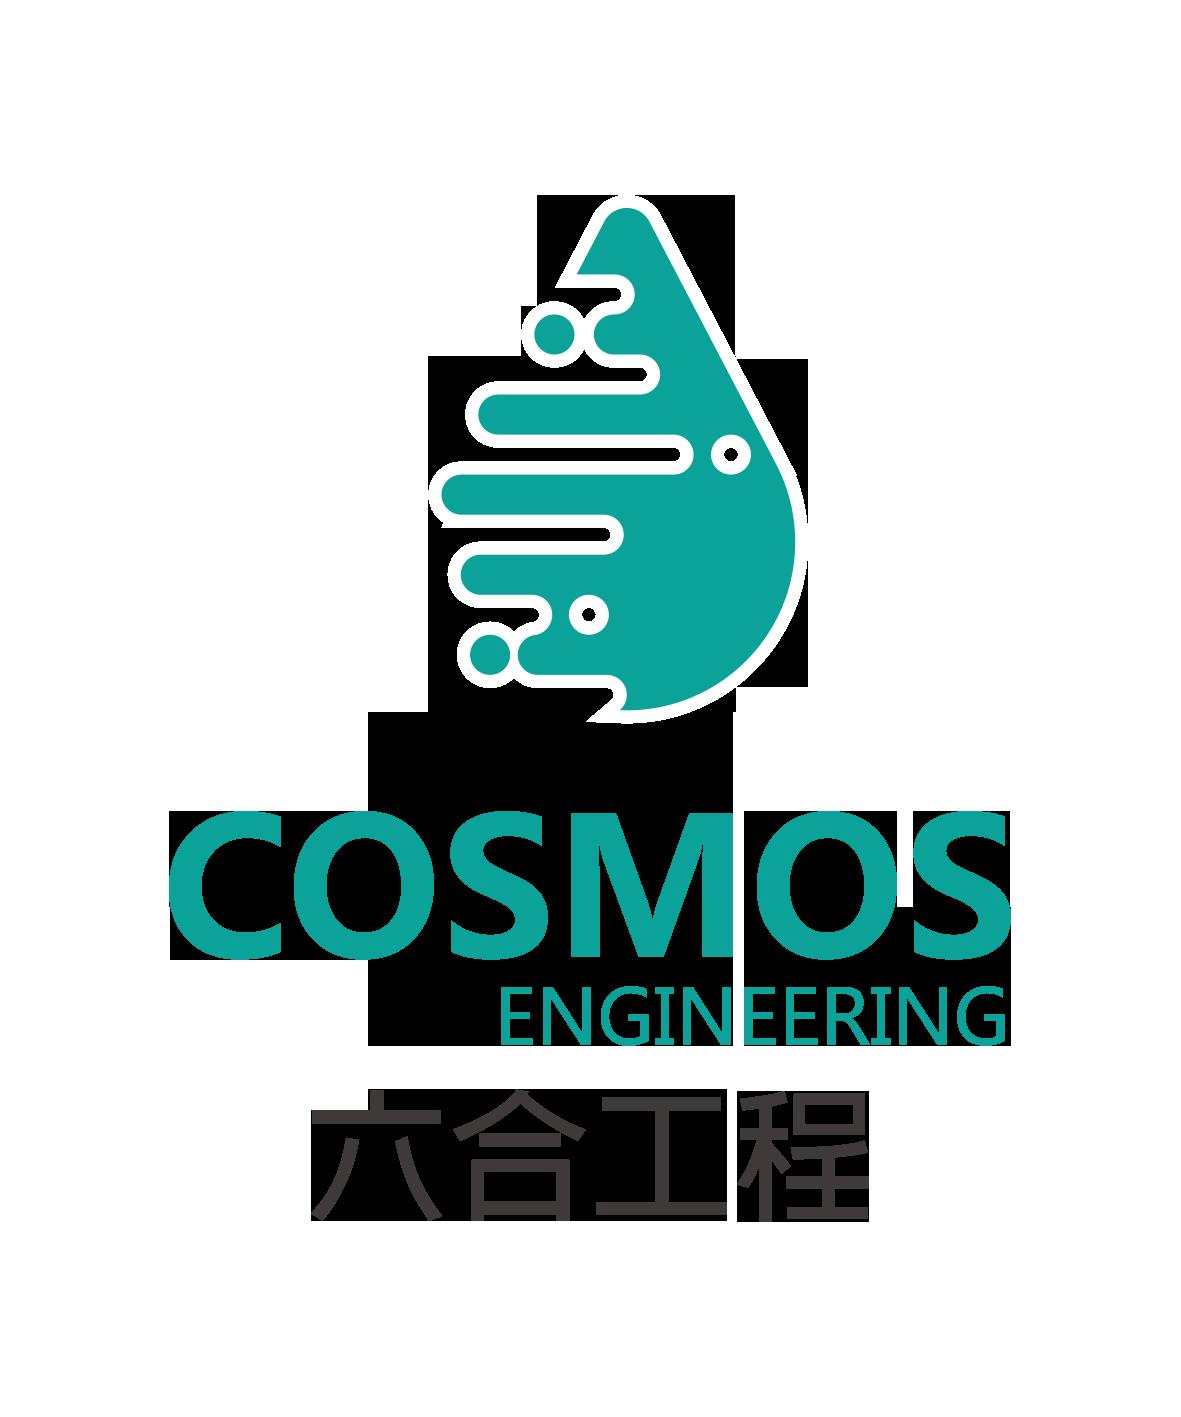 logo-green-shu-cn-2017_11_0310_02_47UTC